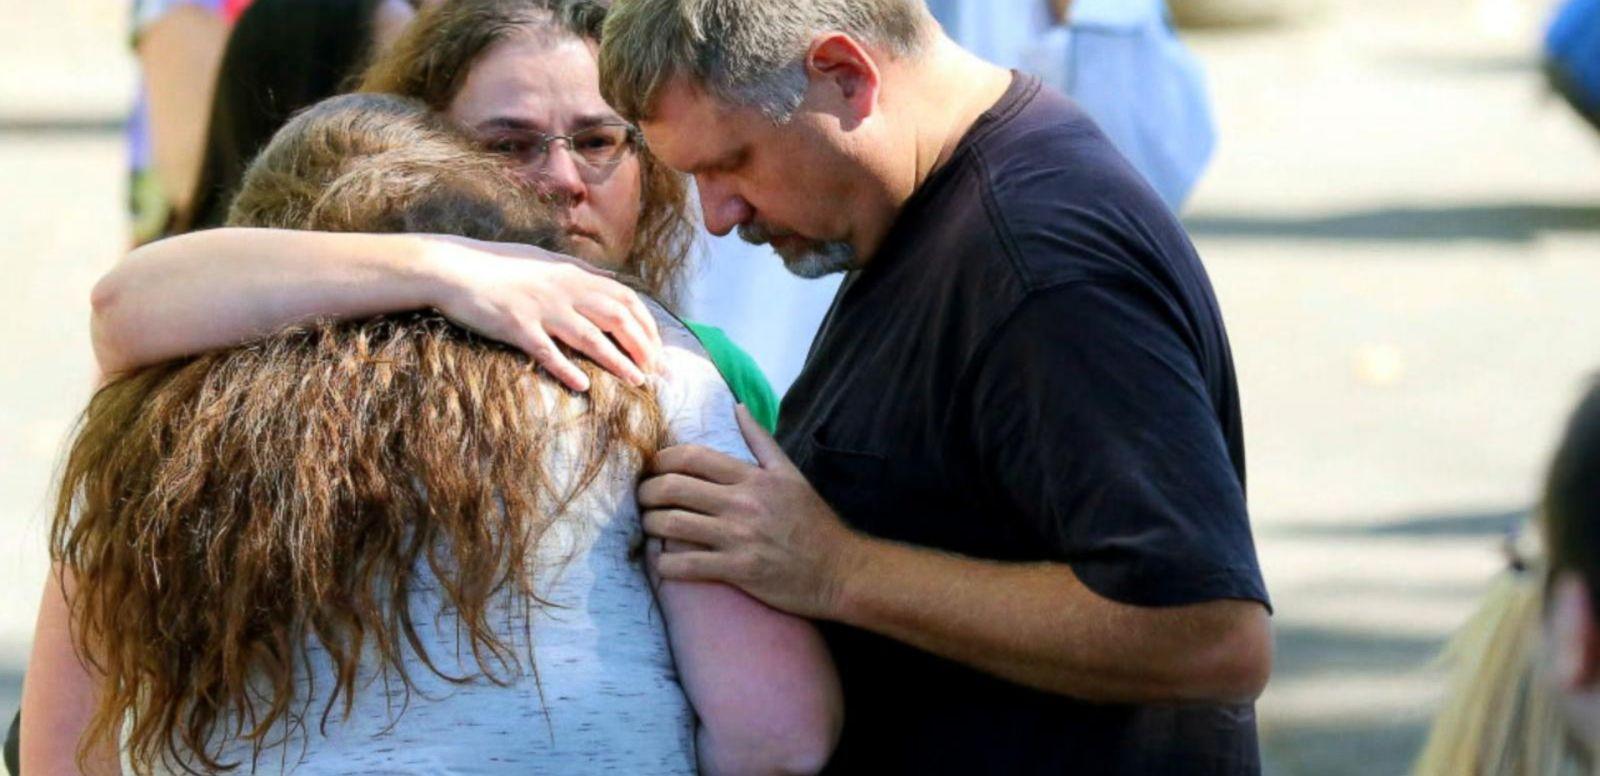 VIDEO: Shooter Opens Fire at Northern Arizona University